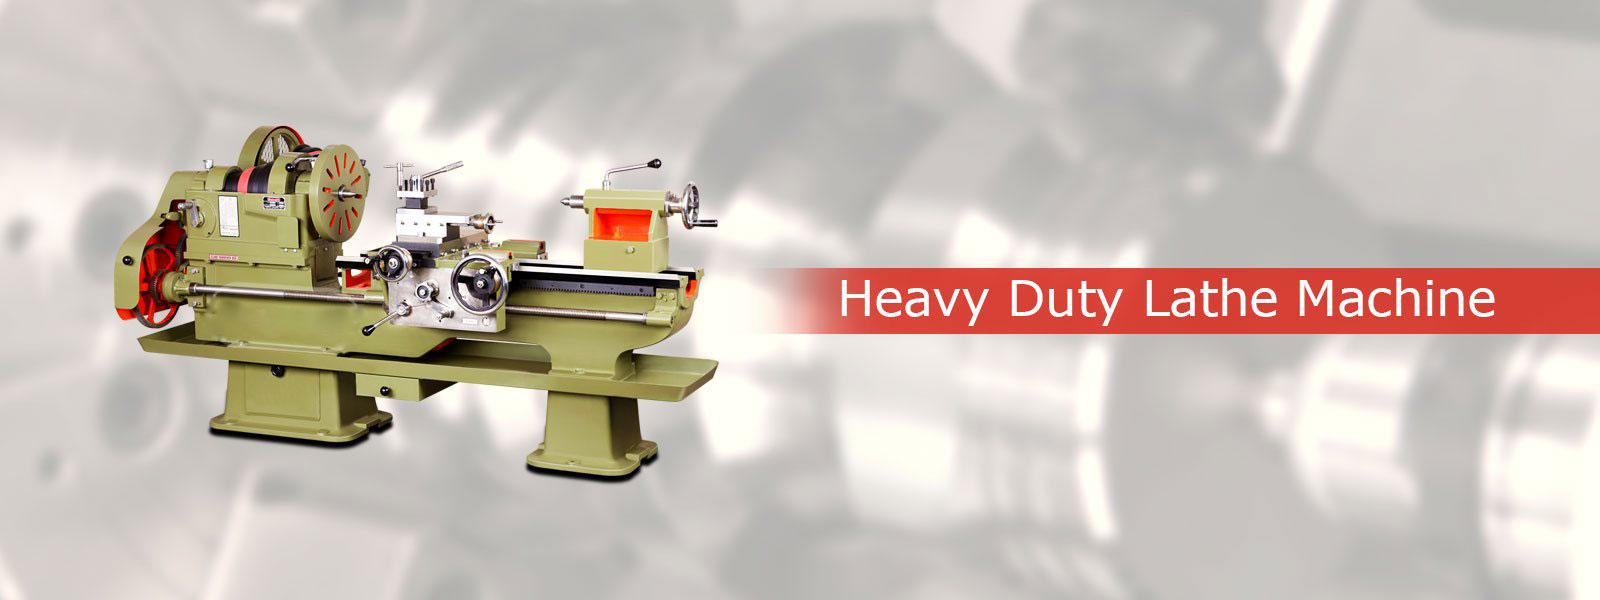 heavy_duty_lathe machnie_exporter